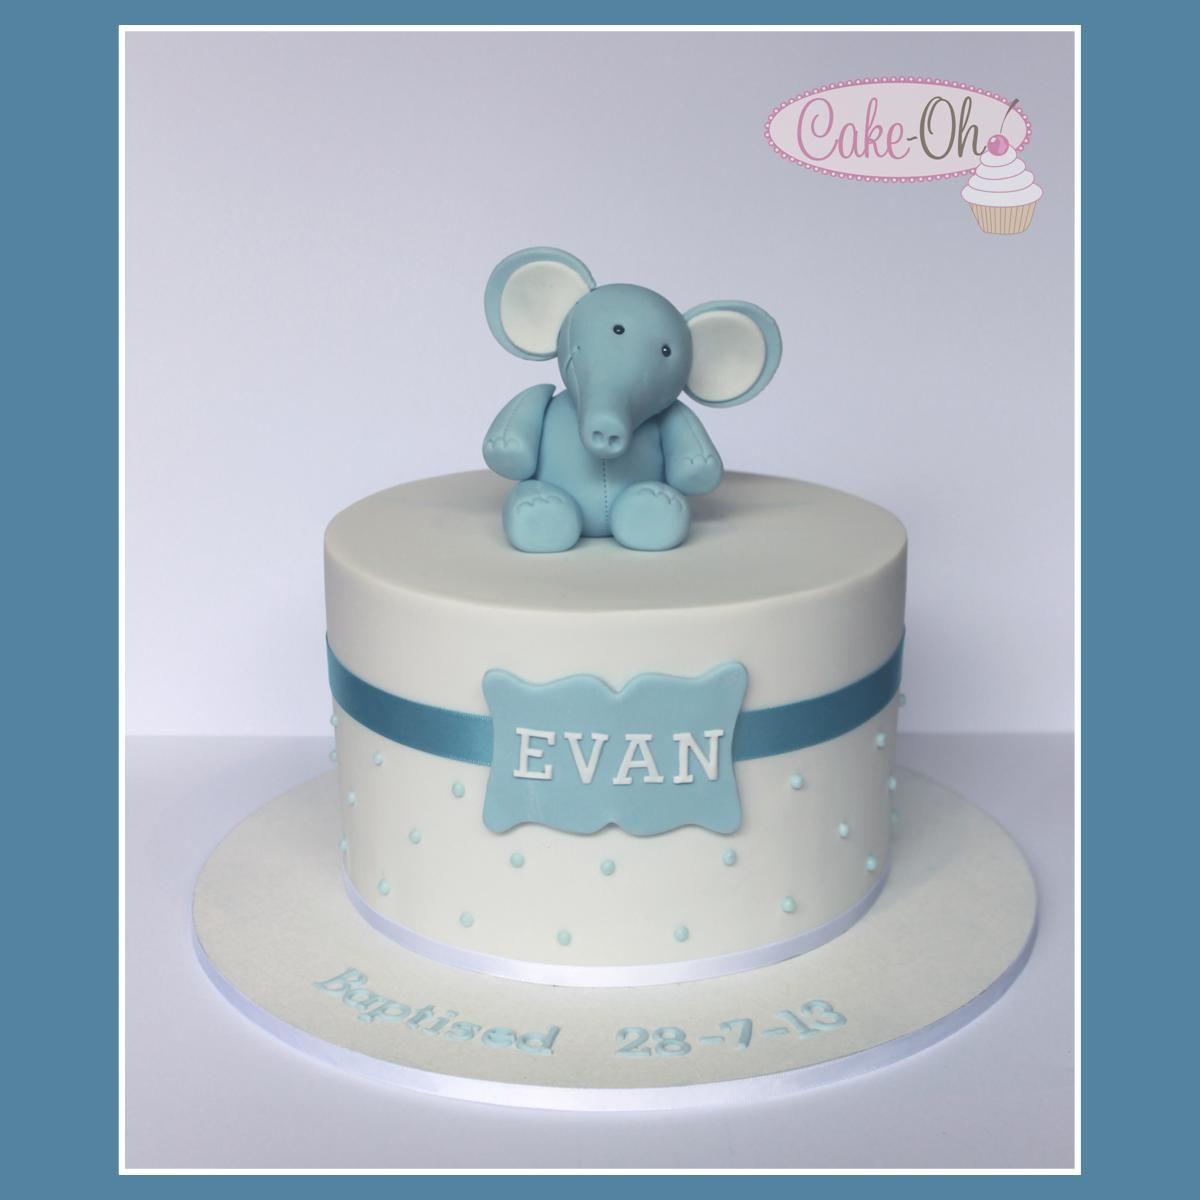 Boy S Baptism Cake Cake Oh